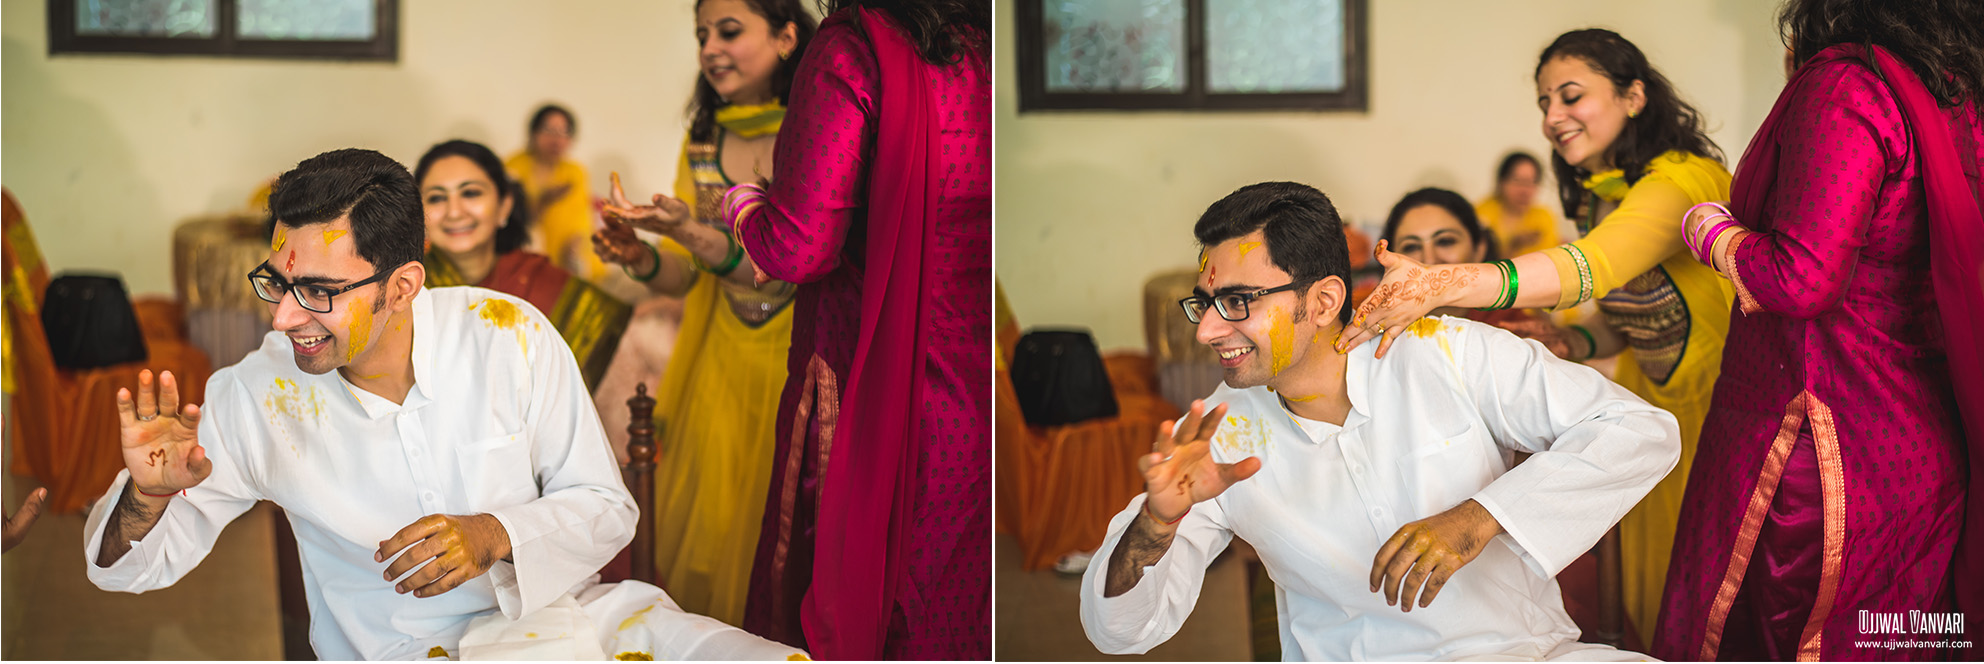 Candid Photographer in Lucknow | Mannat & Rishabh Wedding | Wedding Photography